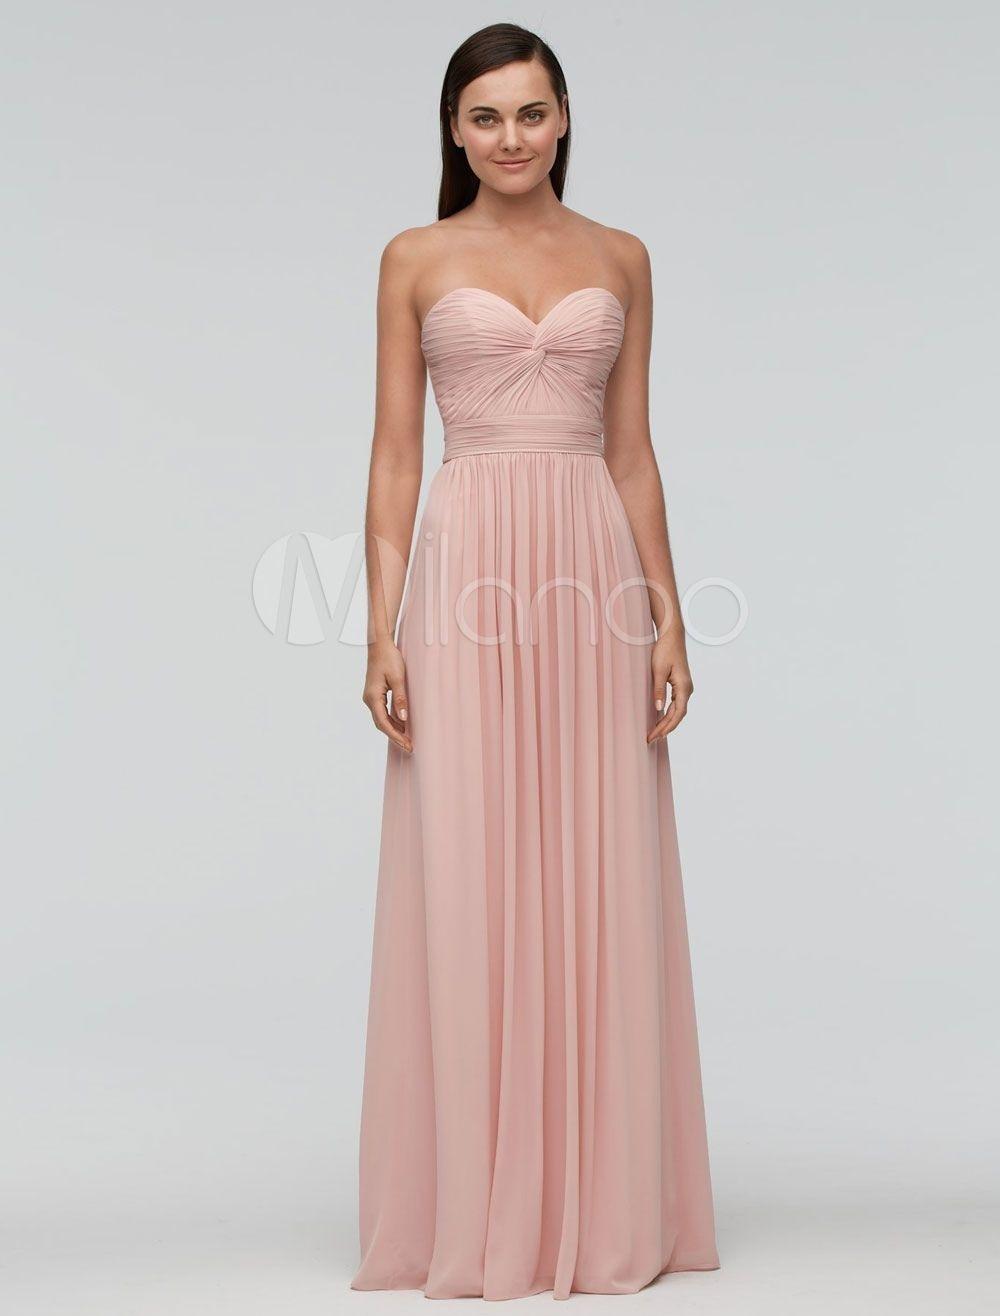 Formal Perfekt Kleid Rosa Hochzeit DesignFormal Elegant Kleid Rosa Hochzeit Design